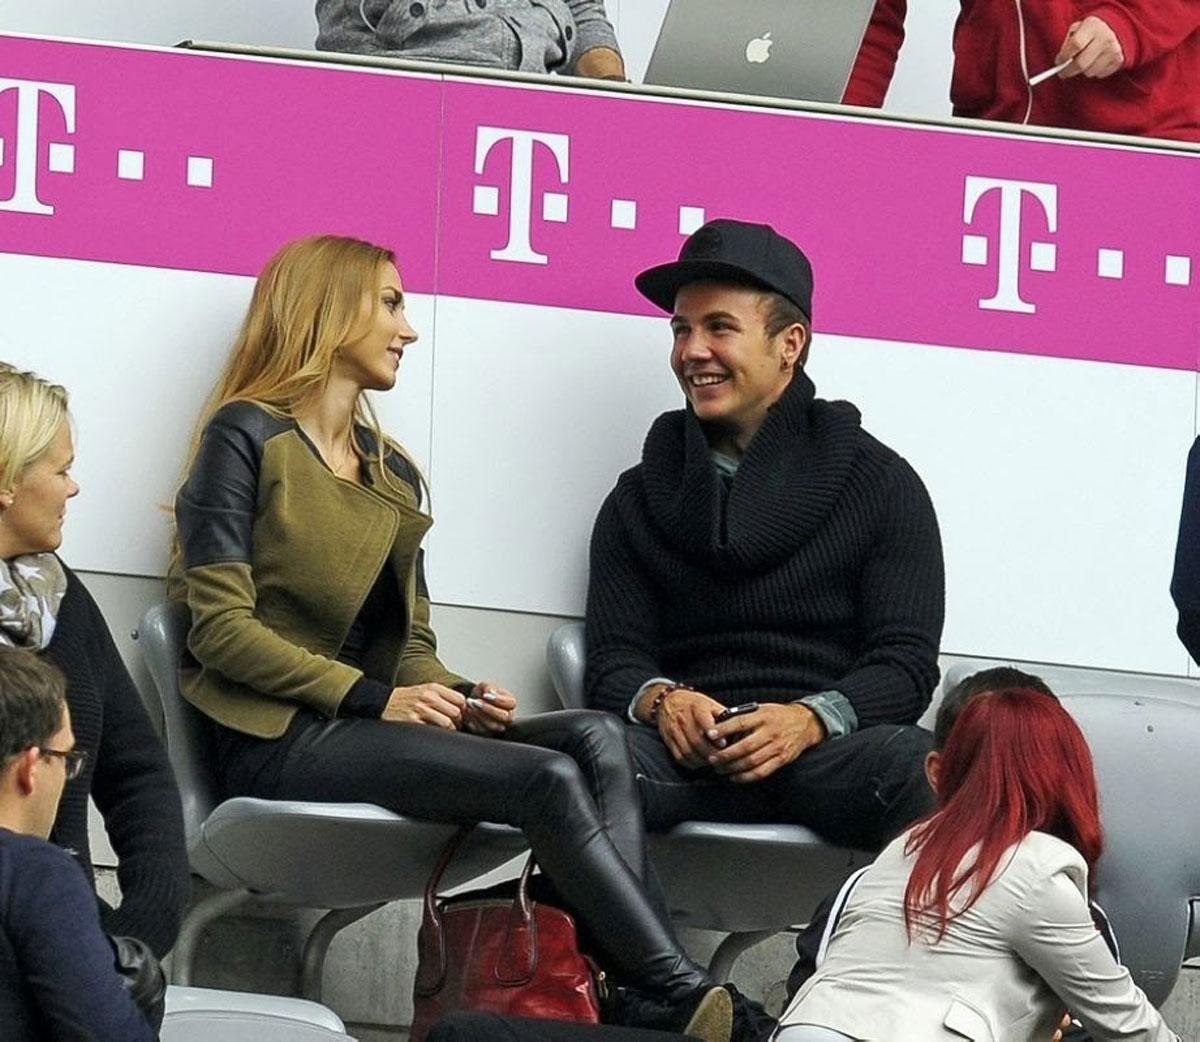 Ann-Kathrin Brommel at Bayern Munich vs Hannover